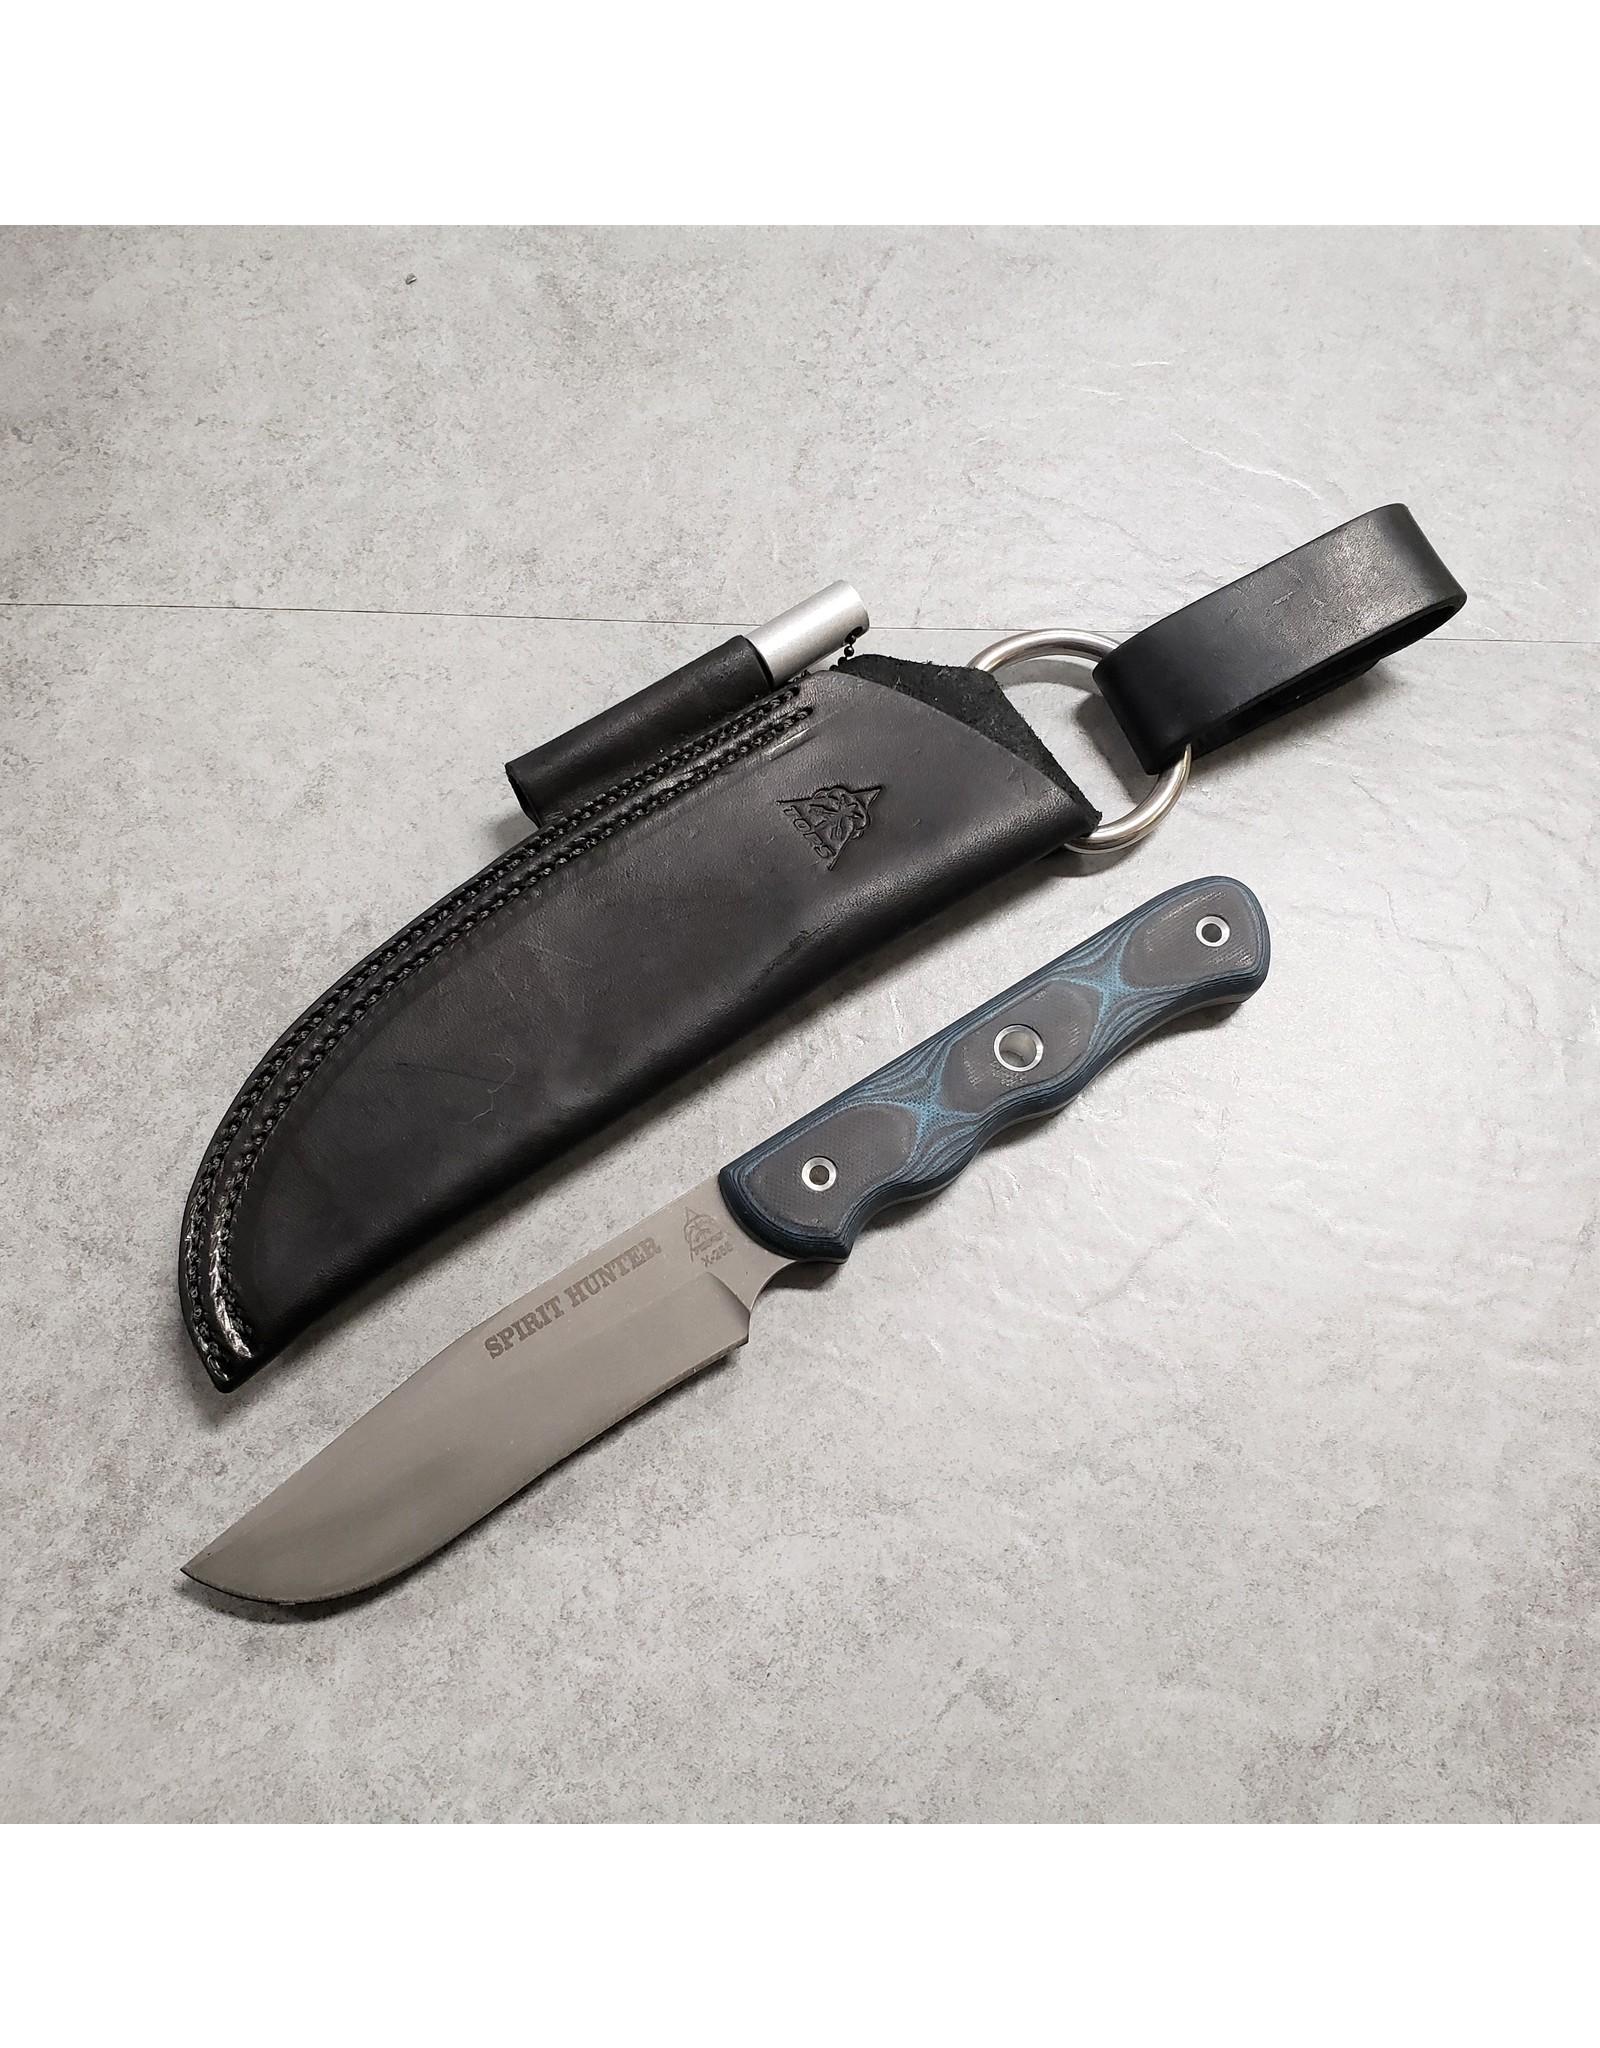 TOPS KNIVES TOPS SPIRIT HUNTER KNIFE